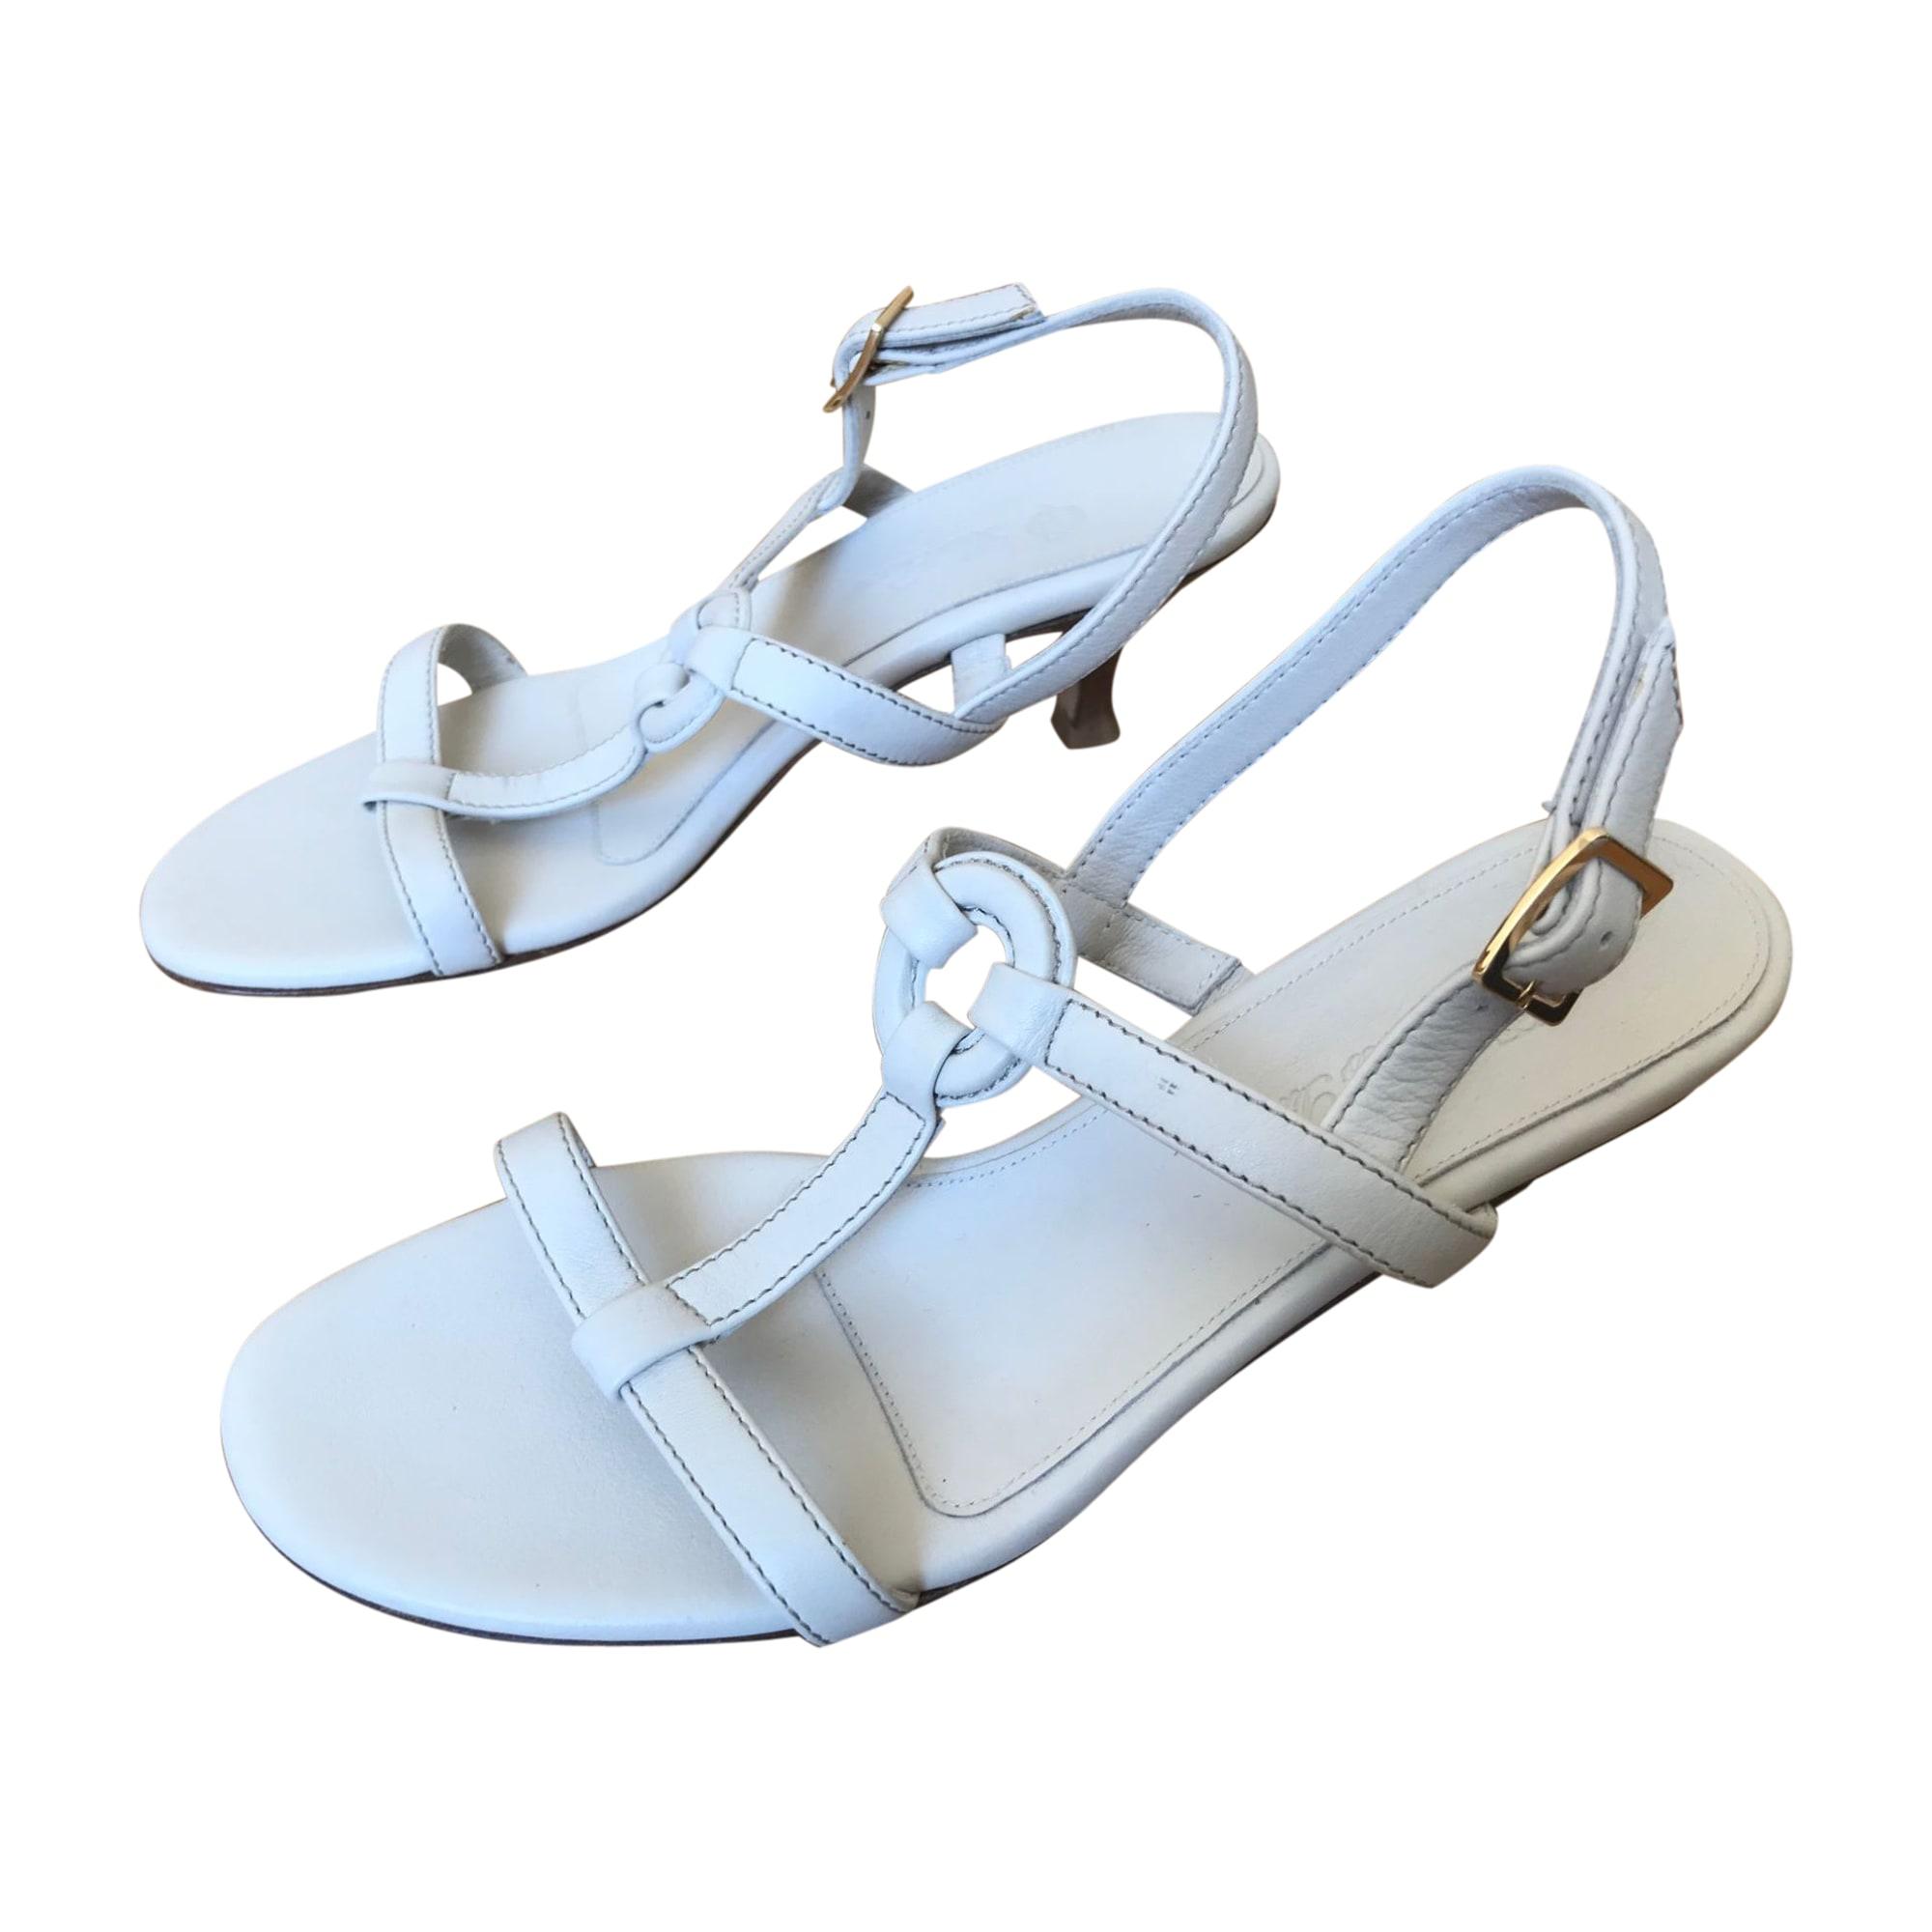 Sandales à talons LORO PIANA Beige, camel